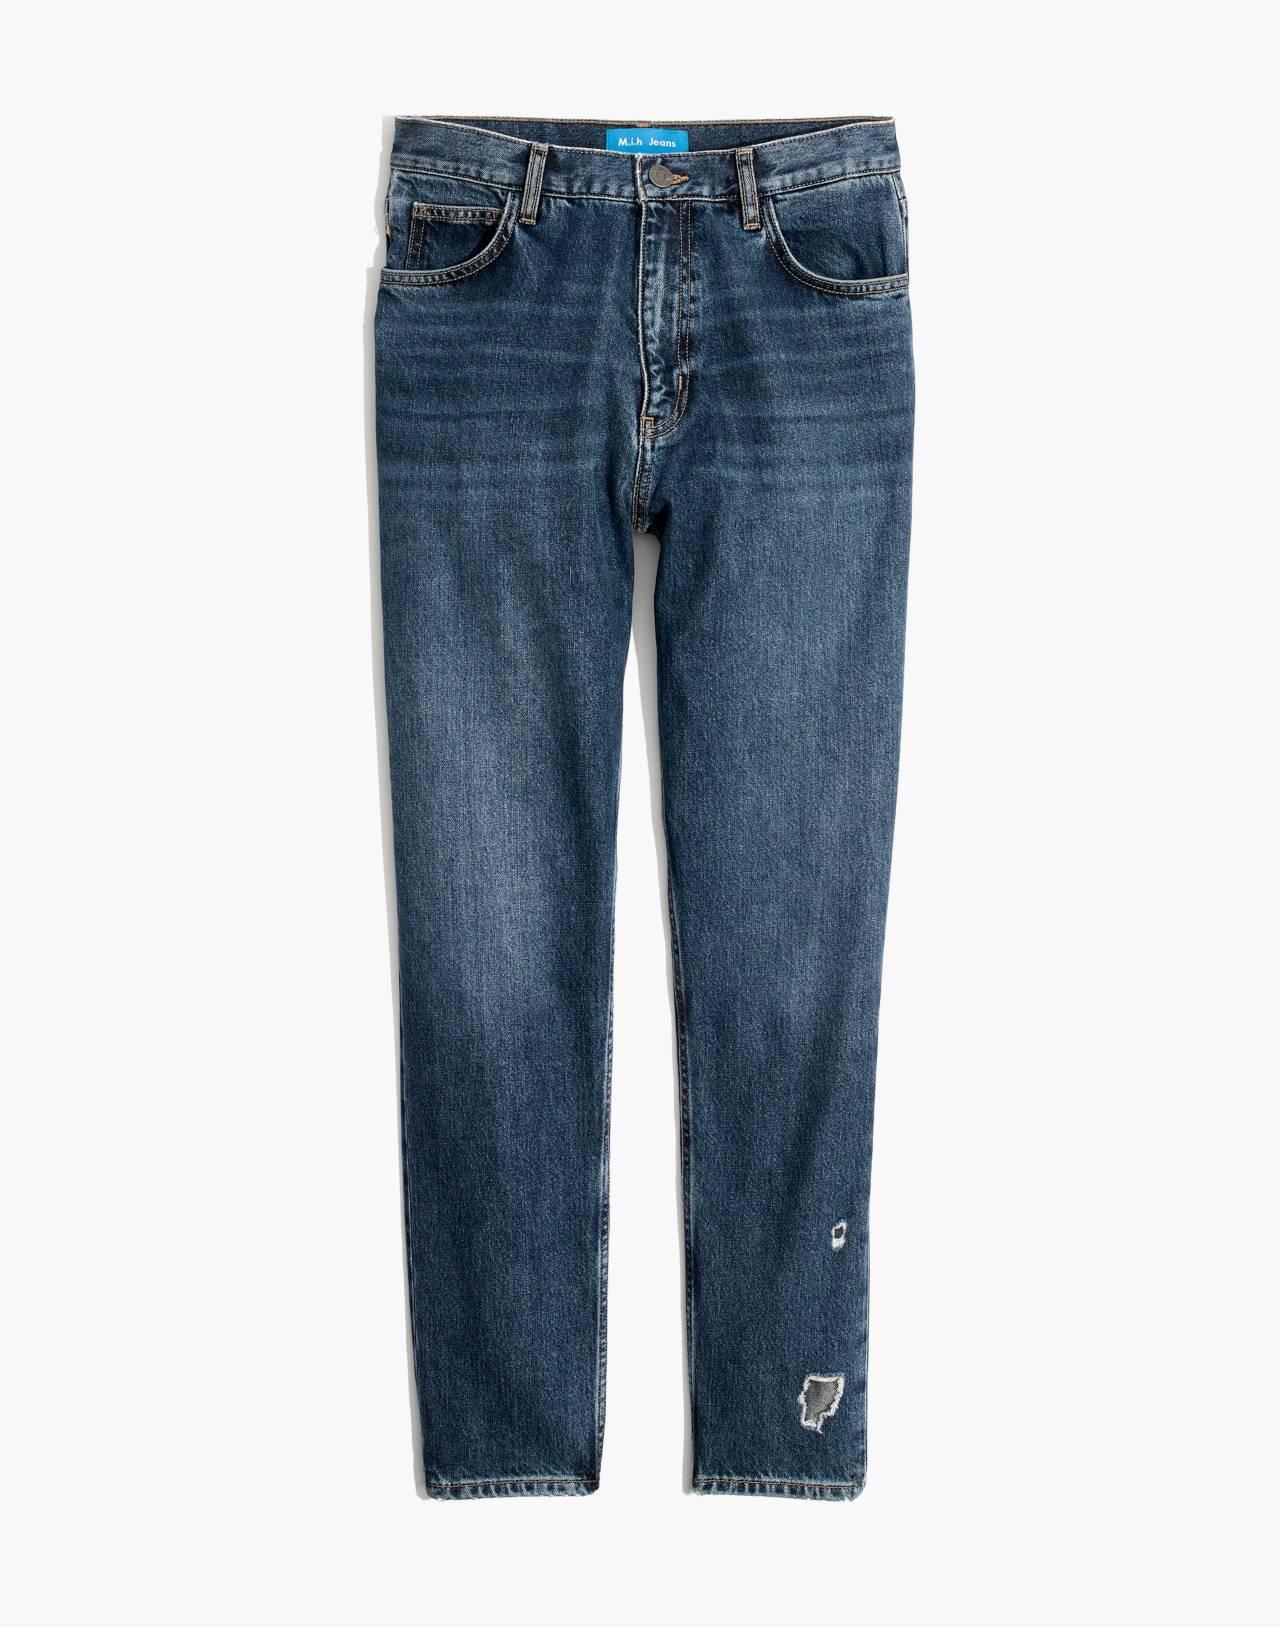 M.i.h® Mimi Jeans in deenie wash image 4